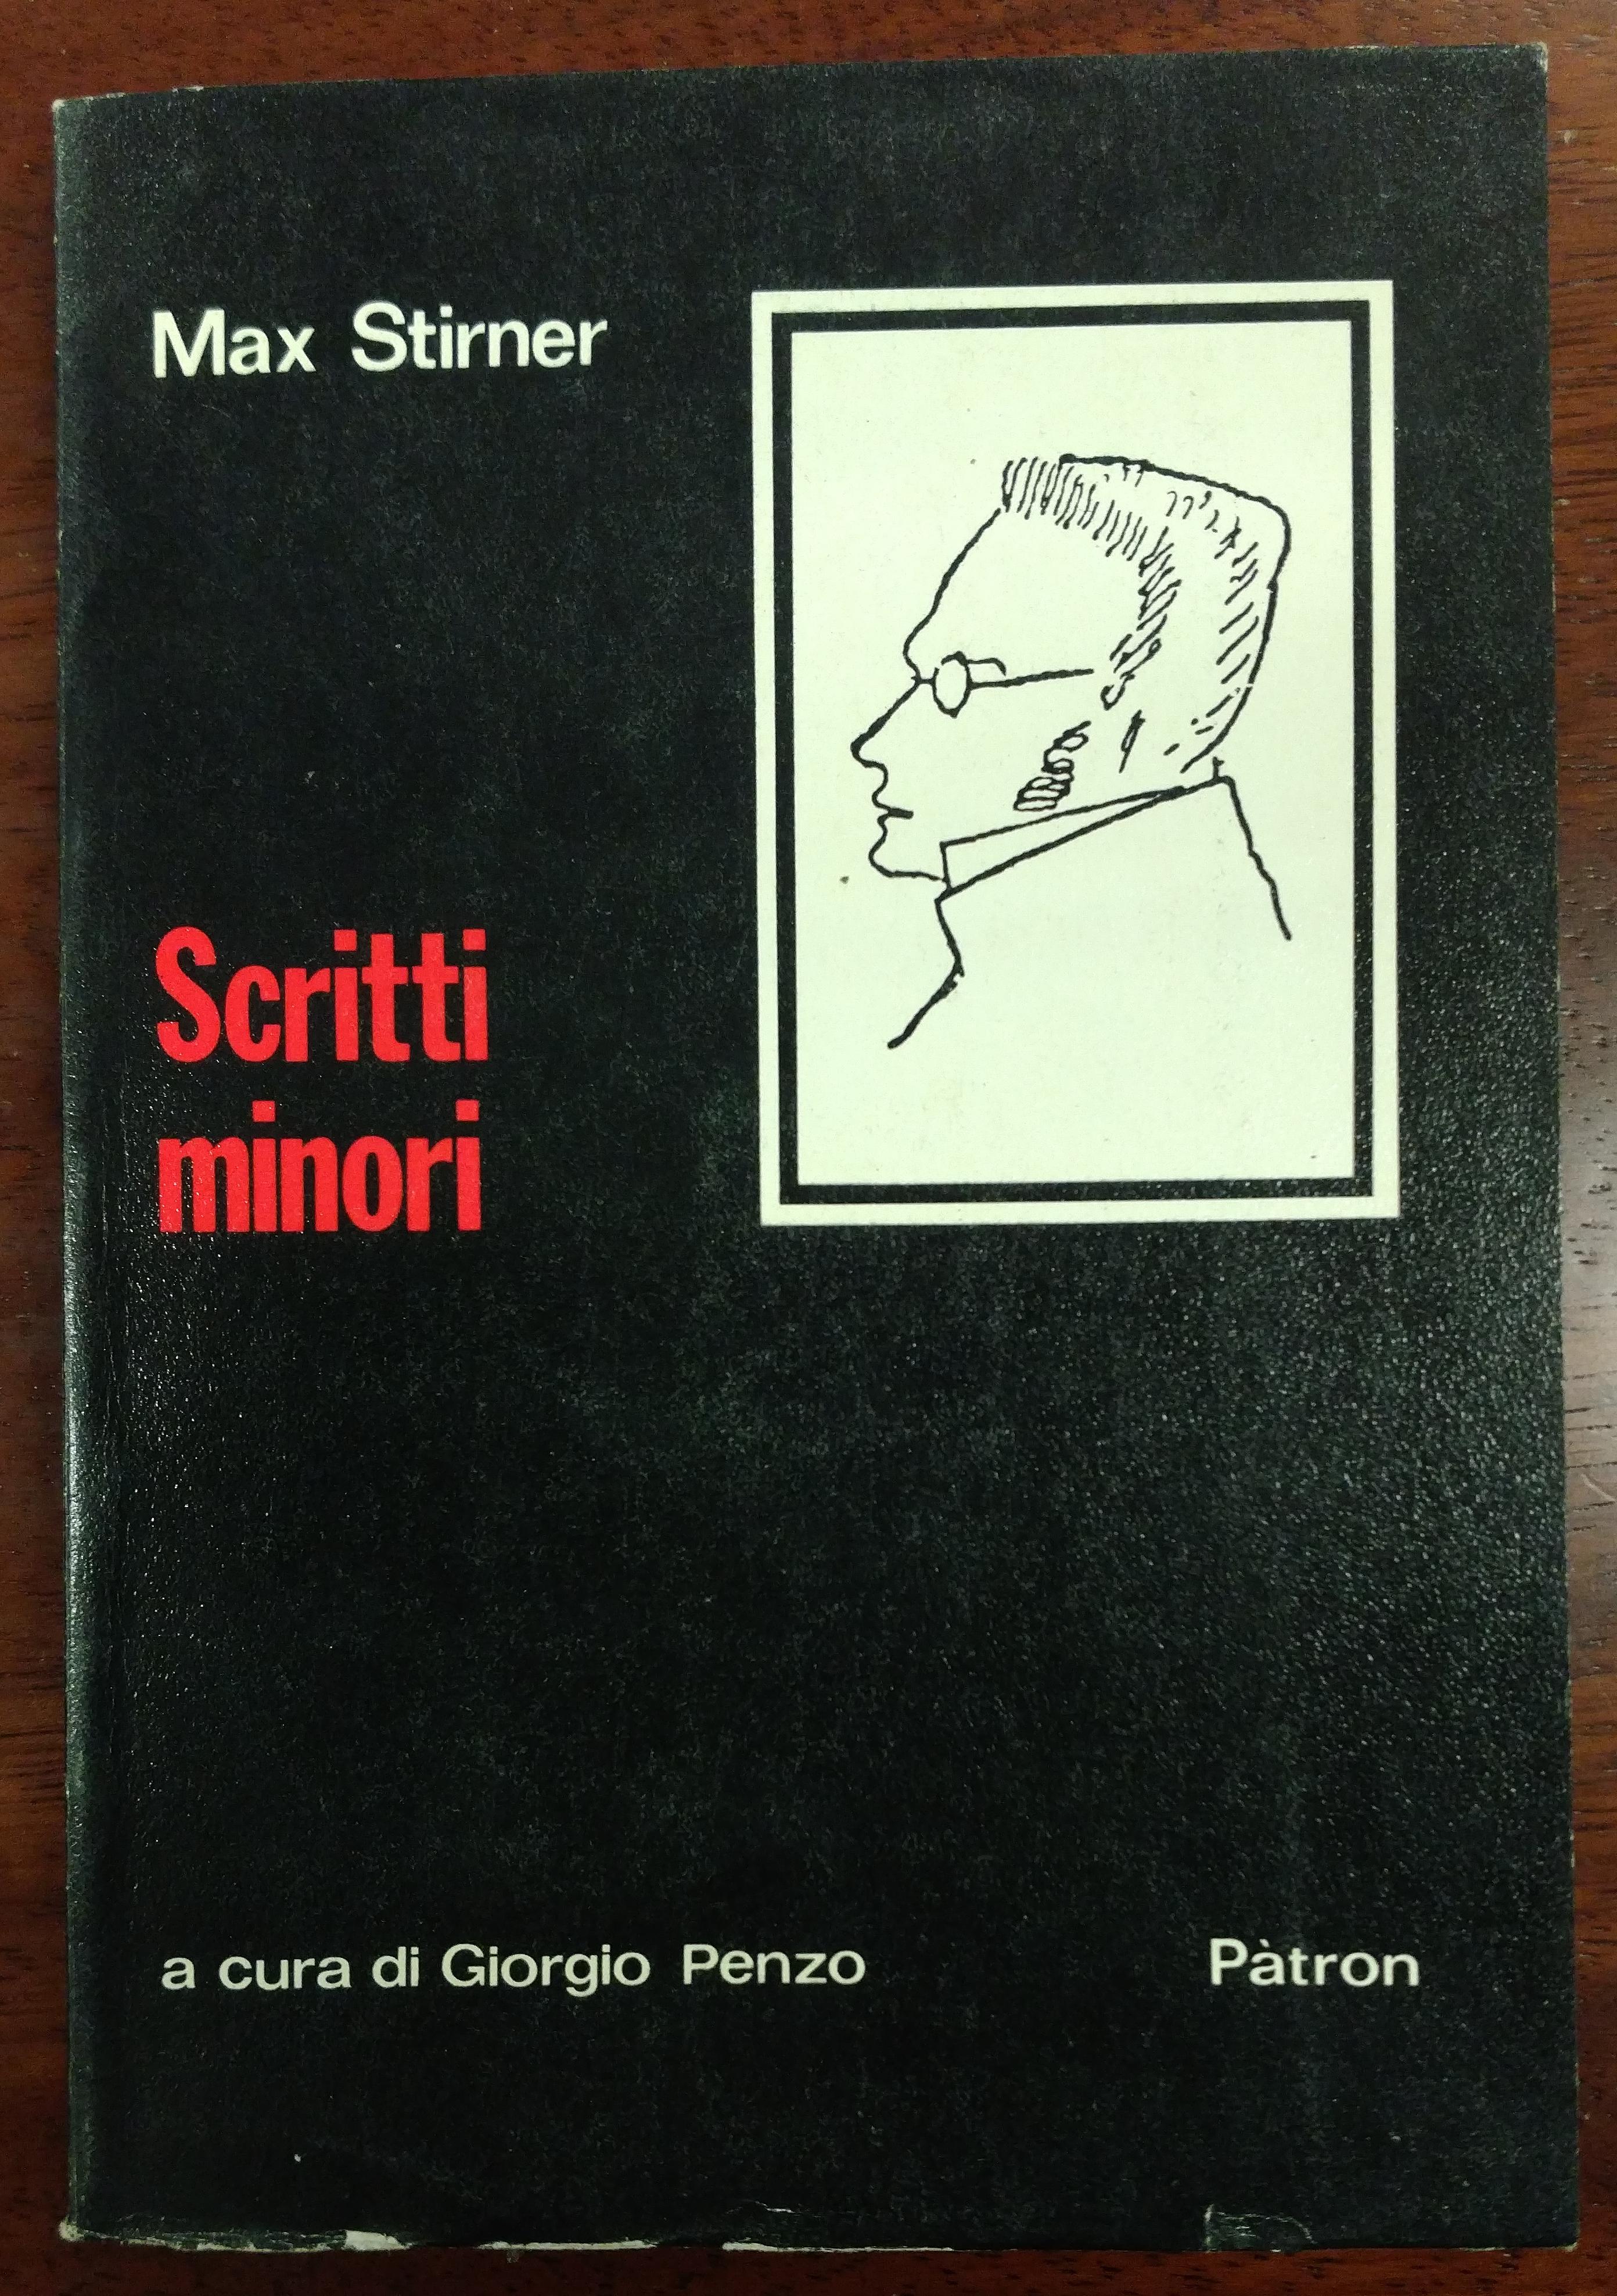 Max Stirner. Scritti minori